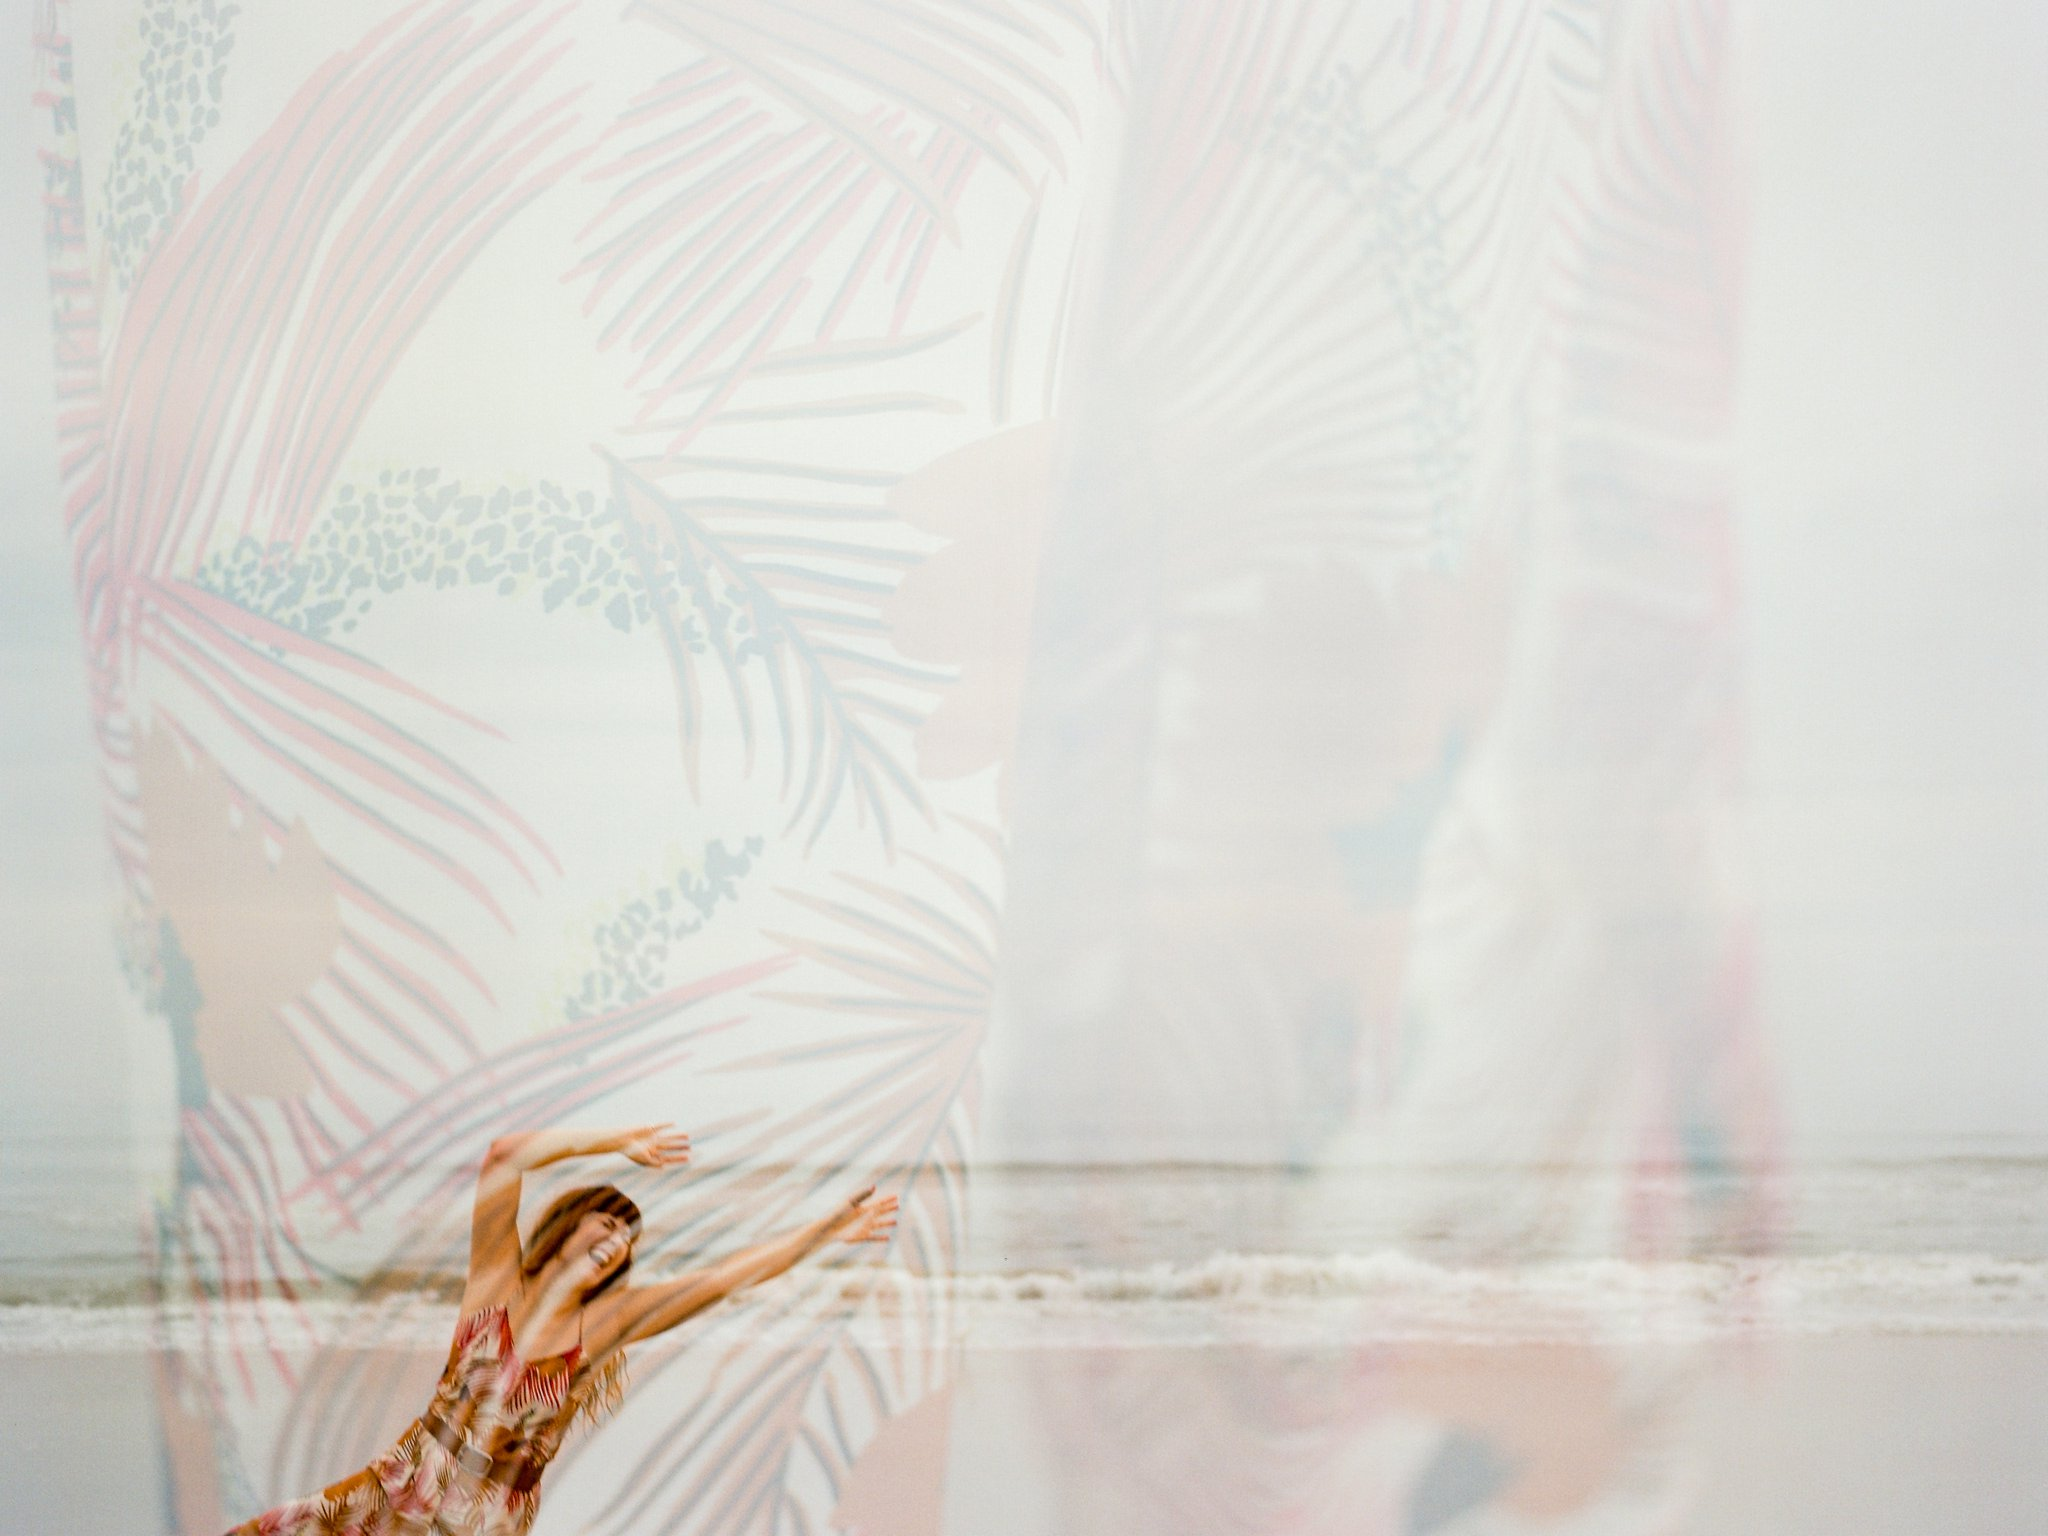 west palm beach branding photographer west palm beach headshot photographer shannon griffin photography_0006.jpg